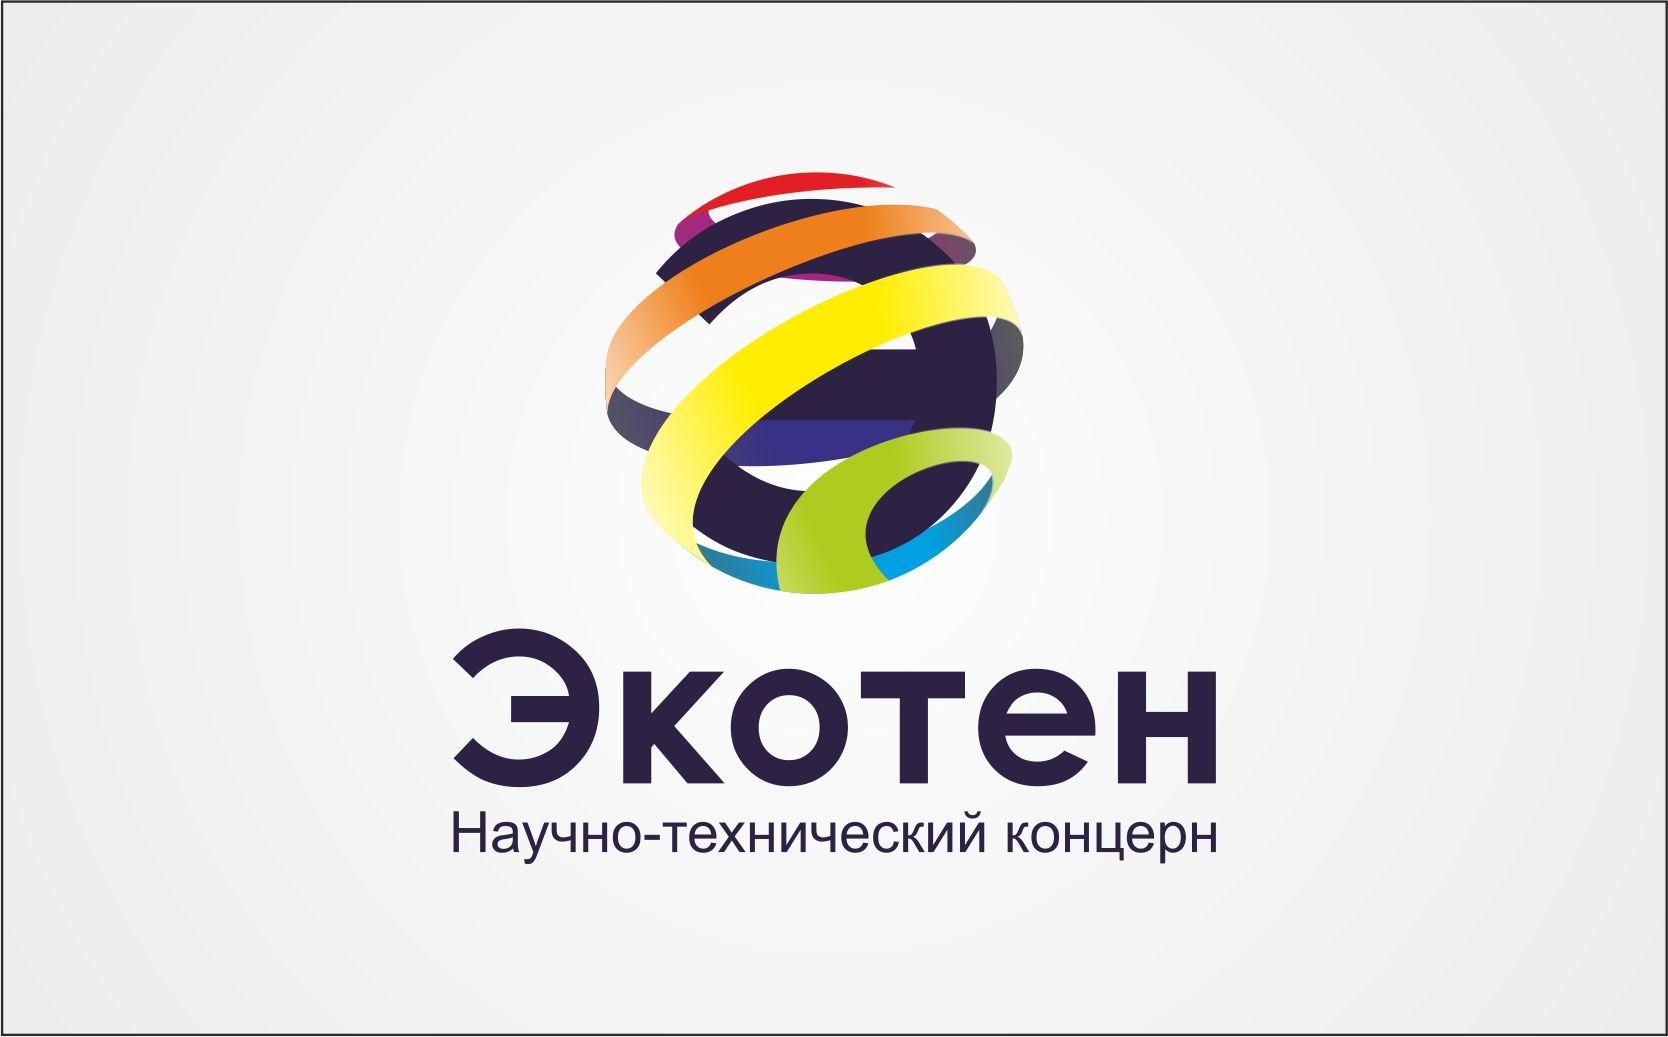 Логотип для научно - технического концерна - дизайнер graphin4ik